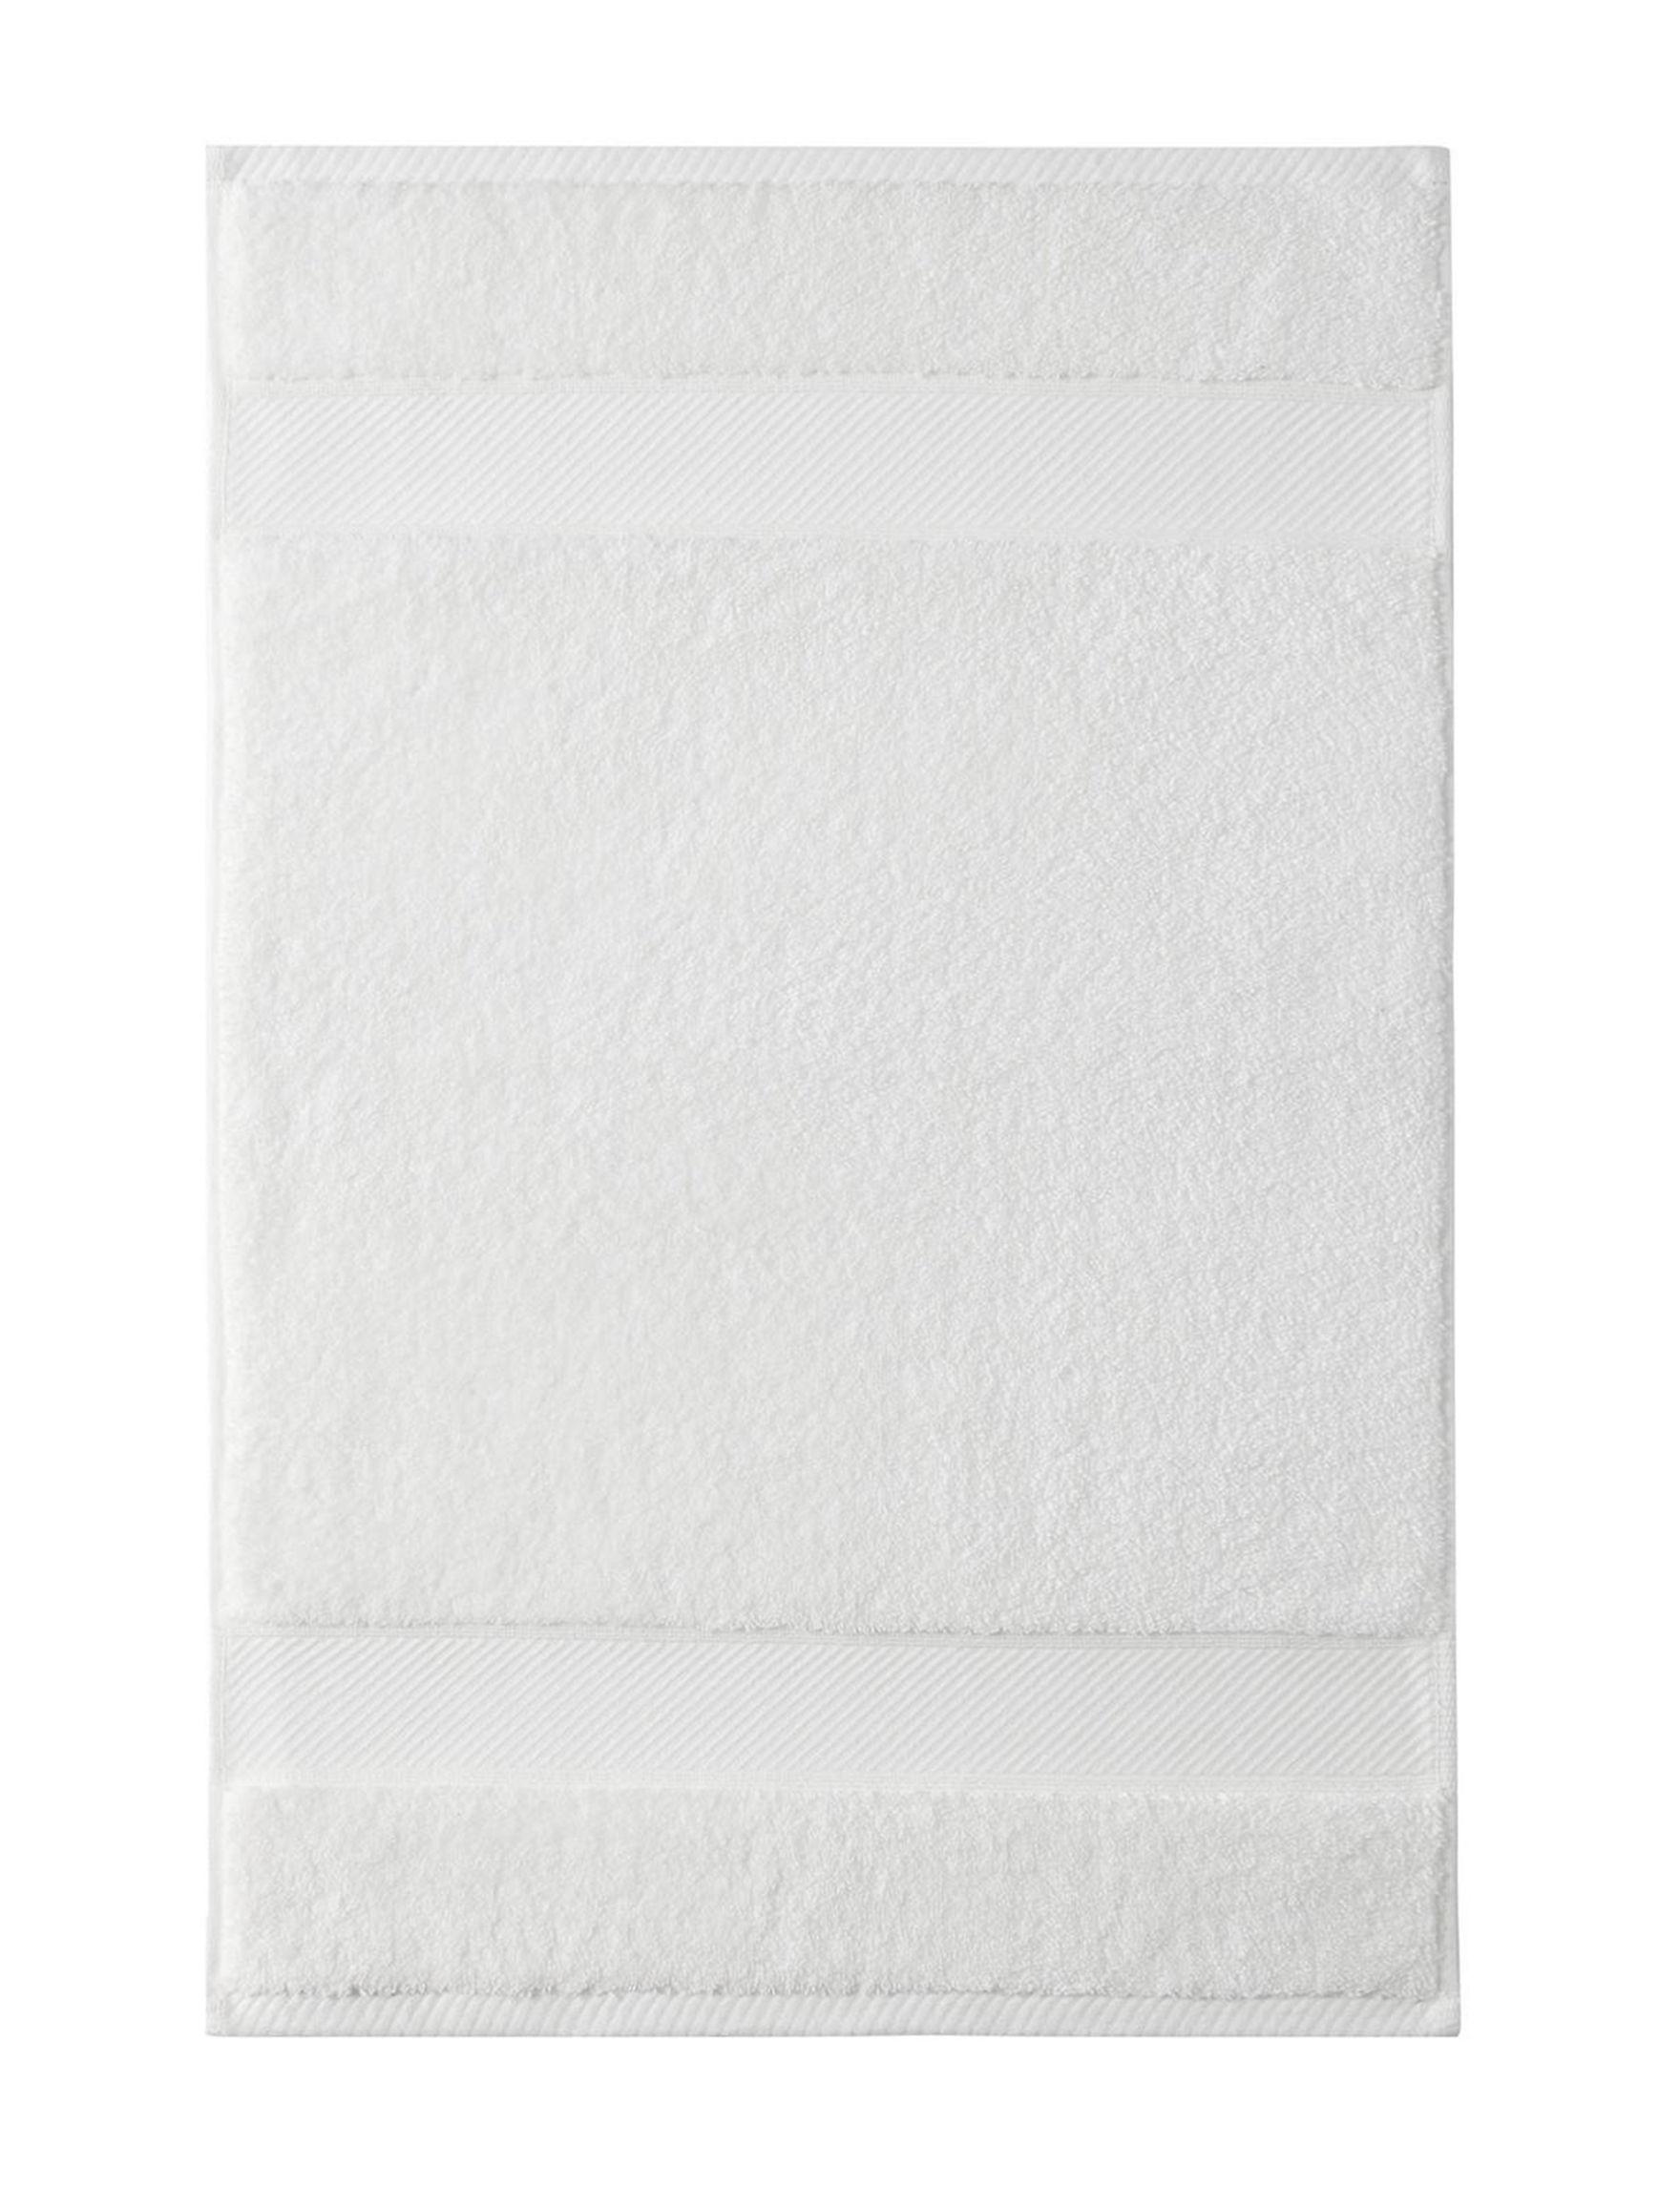 Charisma White Bath Towels Hand Towels Towels